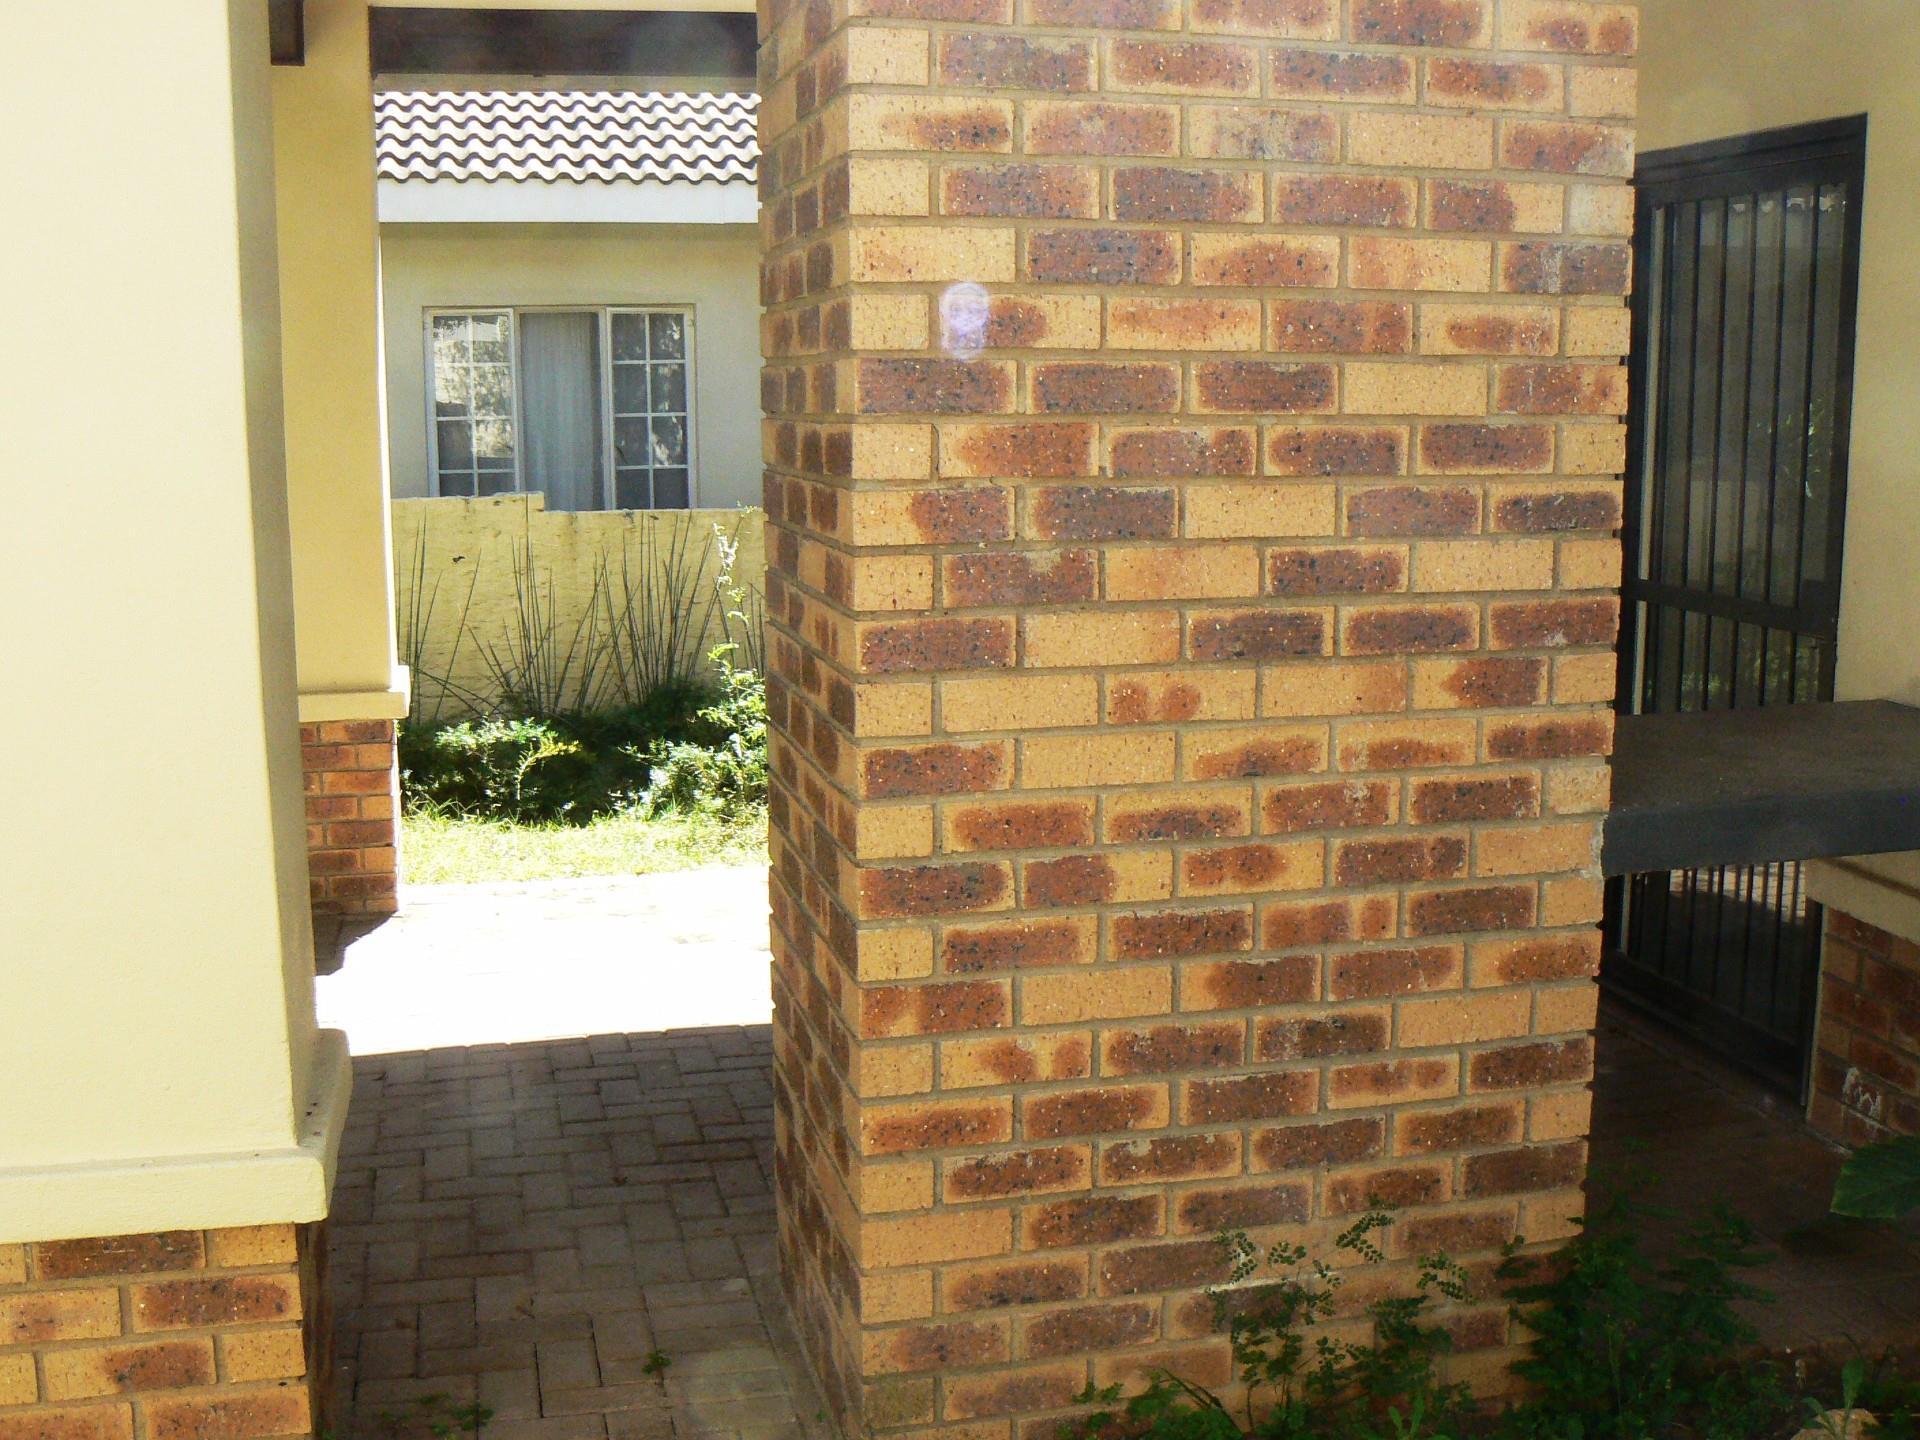 West Acres & Ext property for sale. Ref No: 13485783. Picture no 10